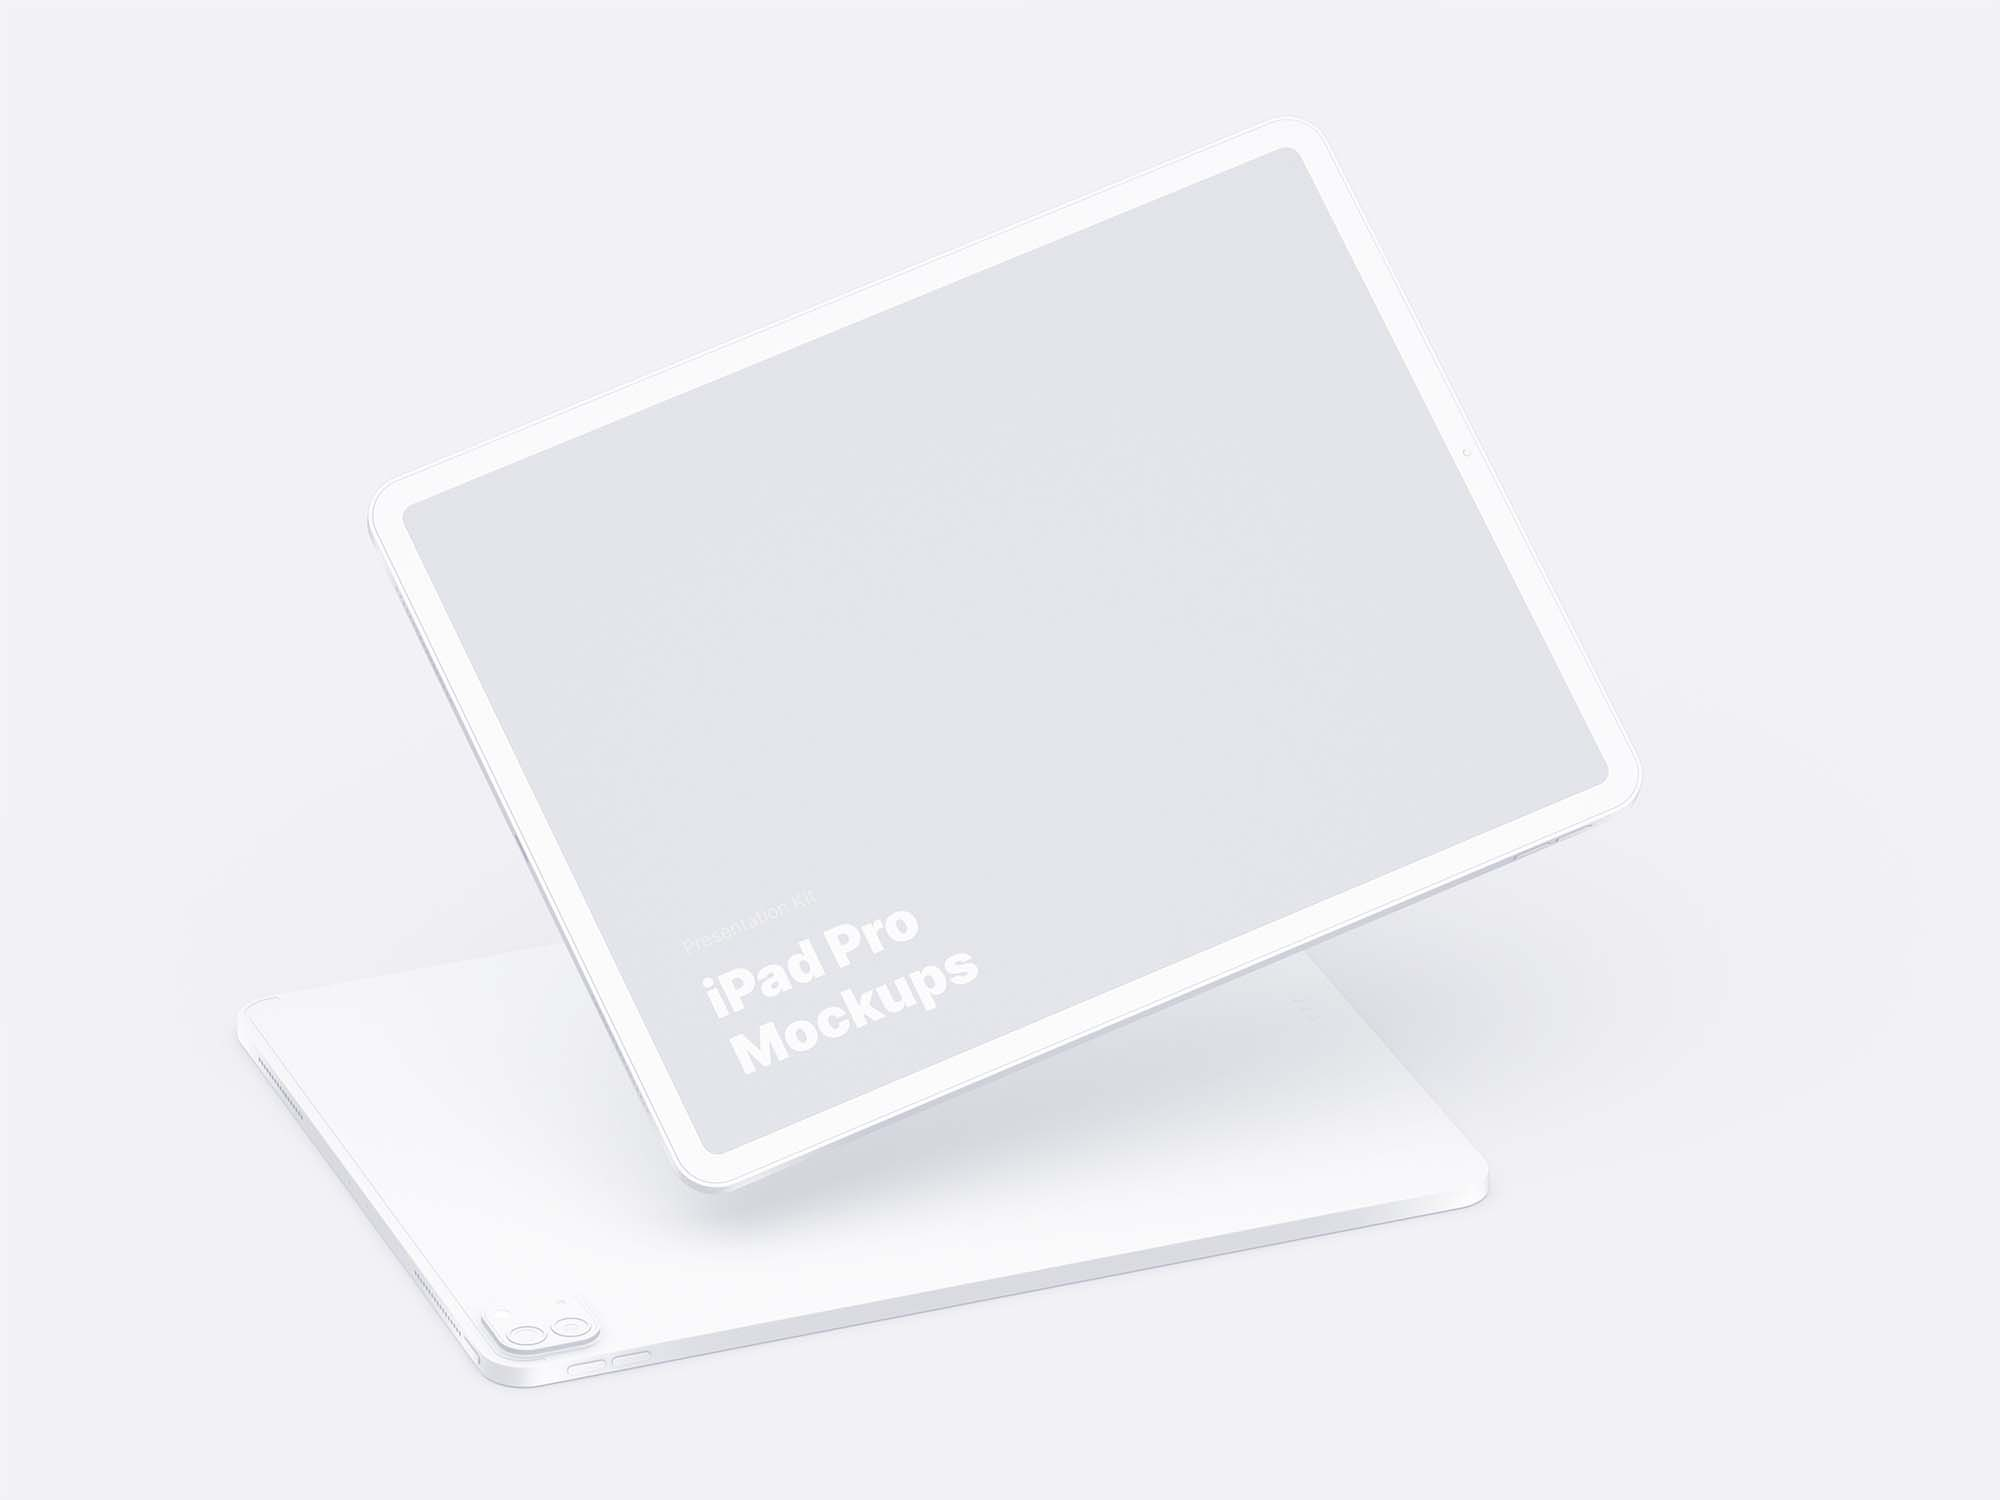 iPad Pro Mockup 3